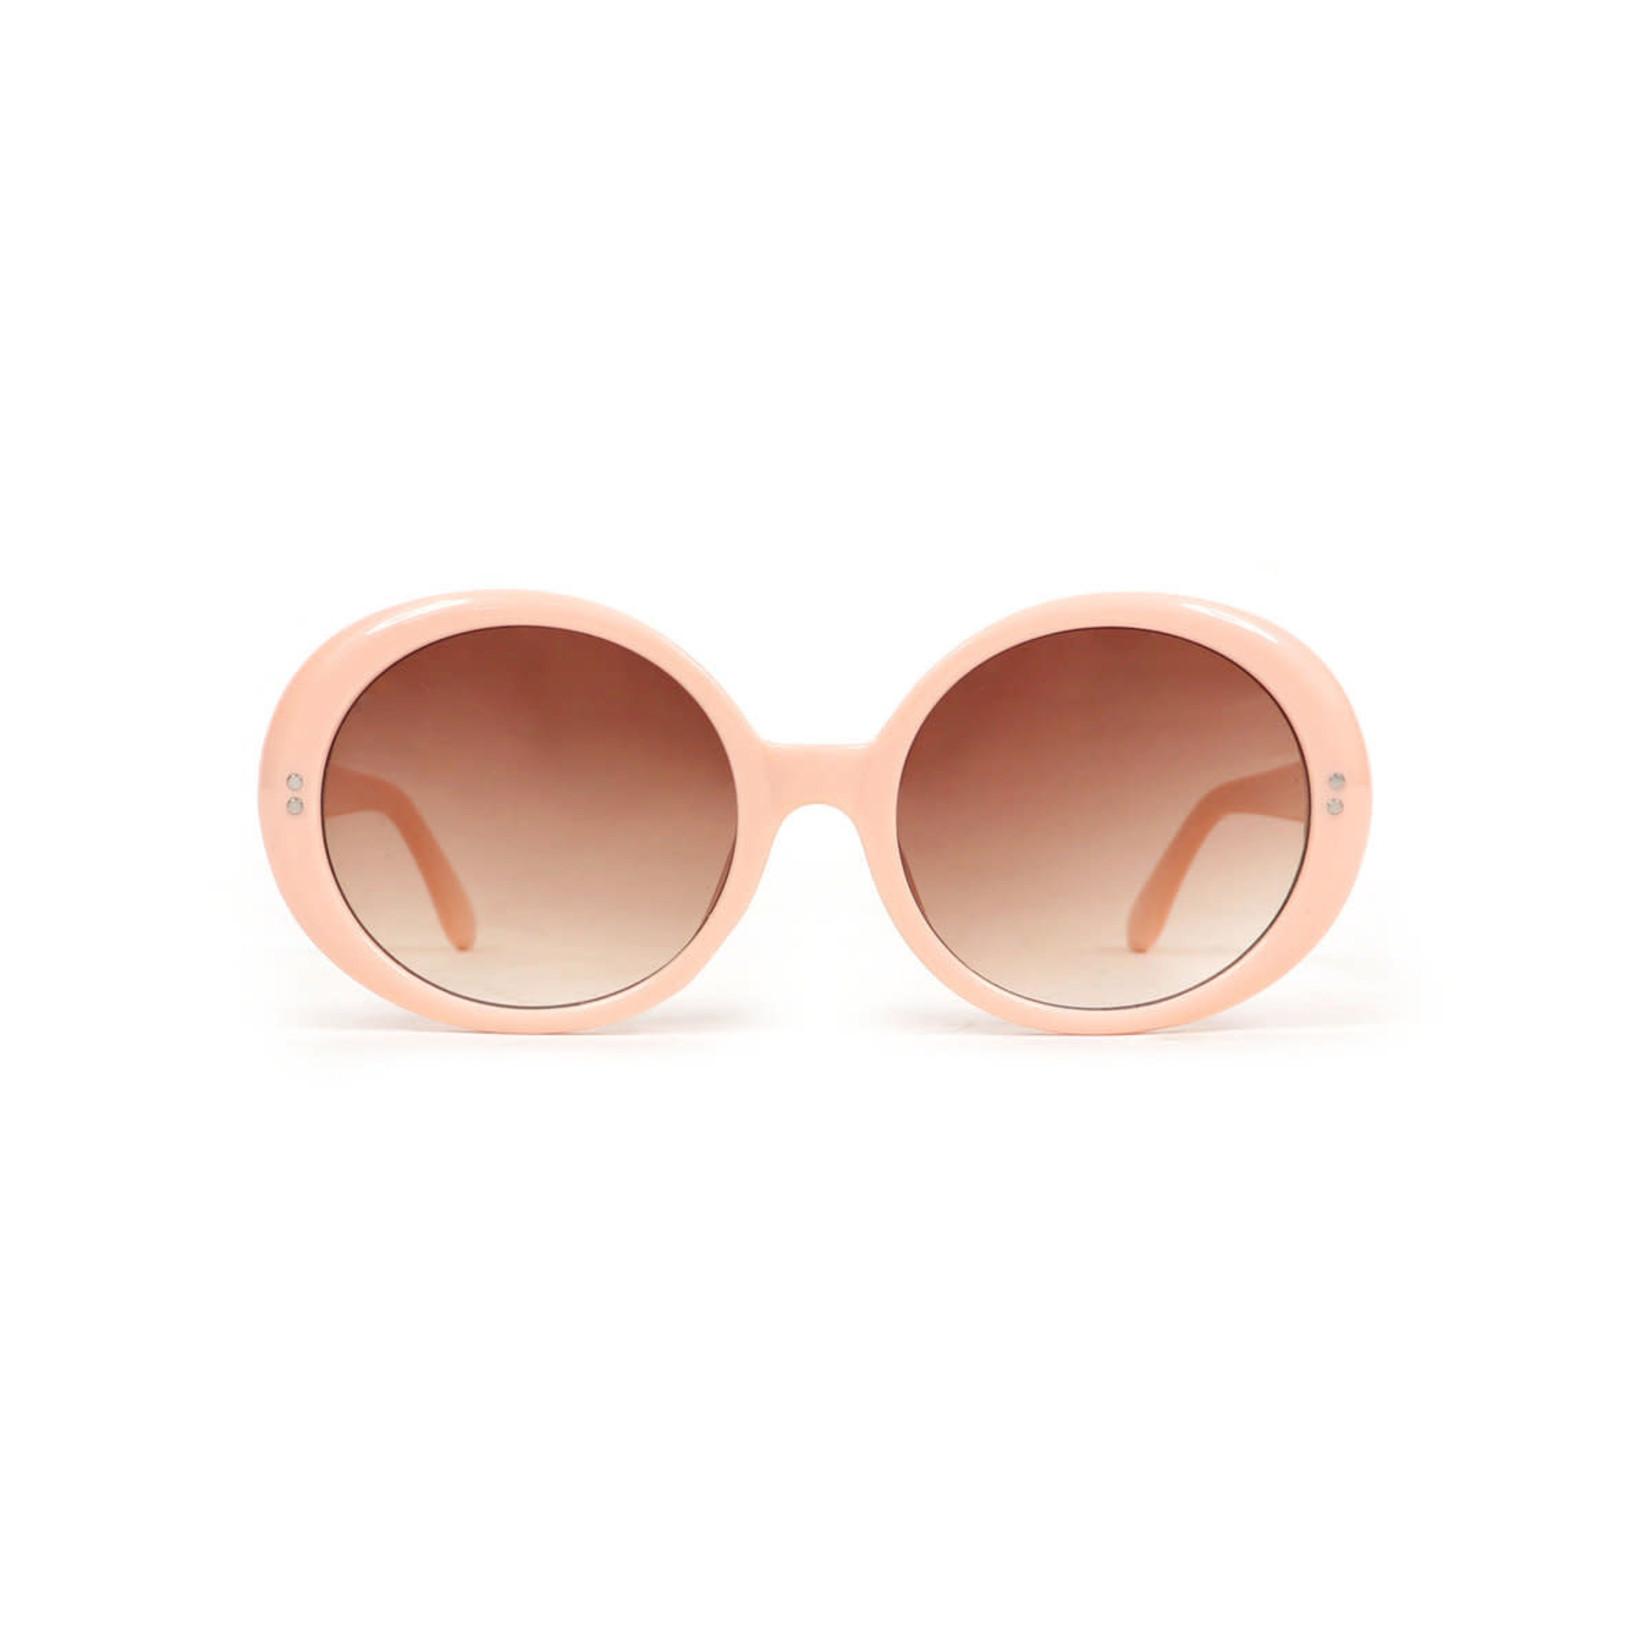 Powder Callie Cream Sunglasses